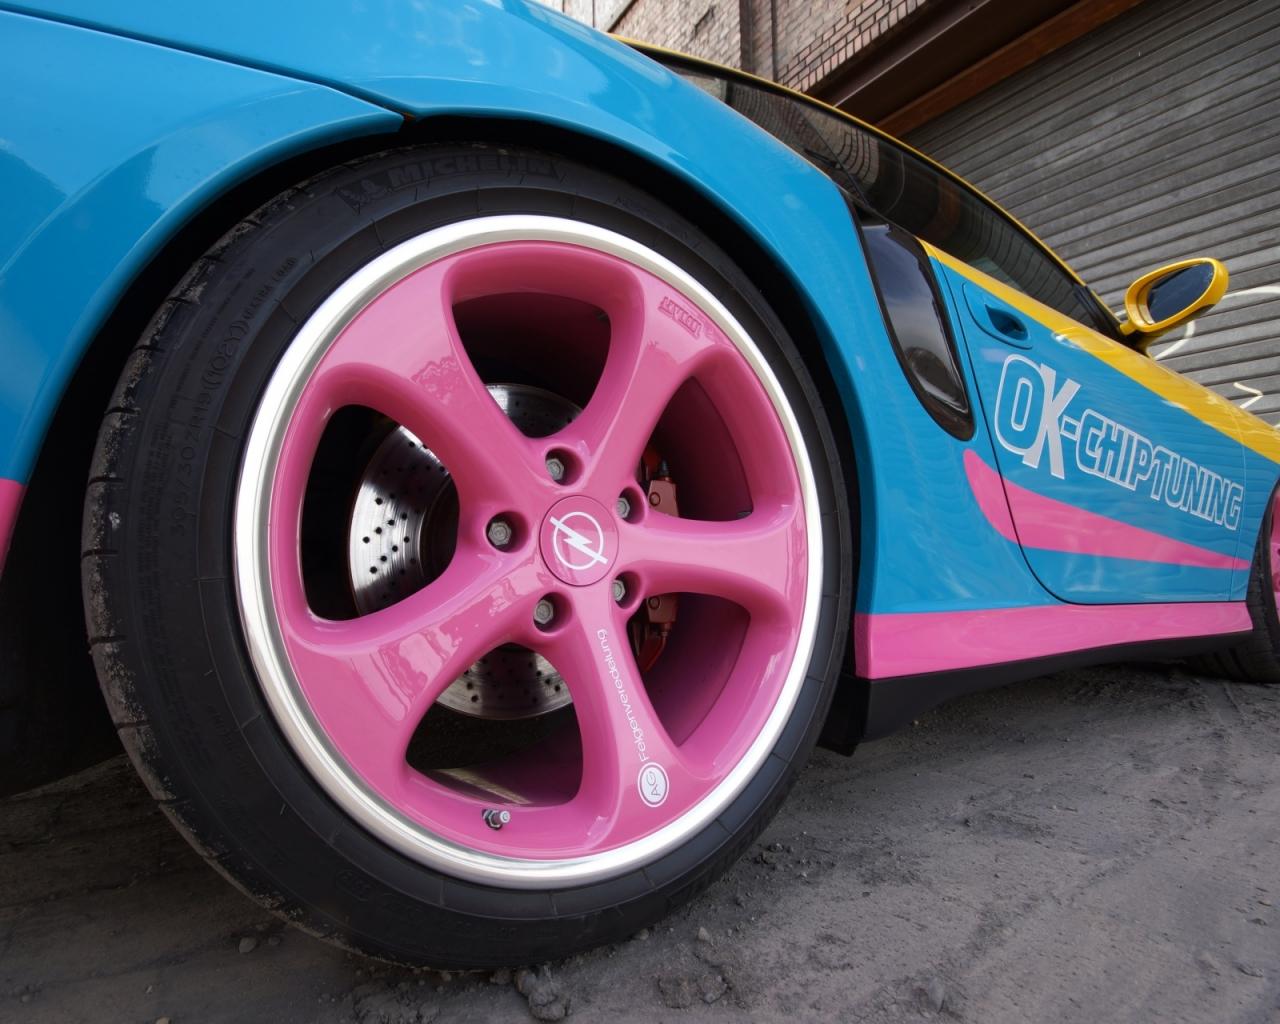 Un auto de colores - 1280x1024